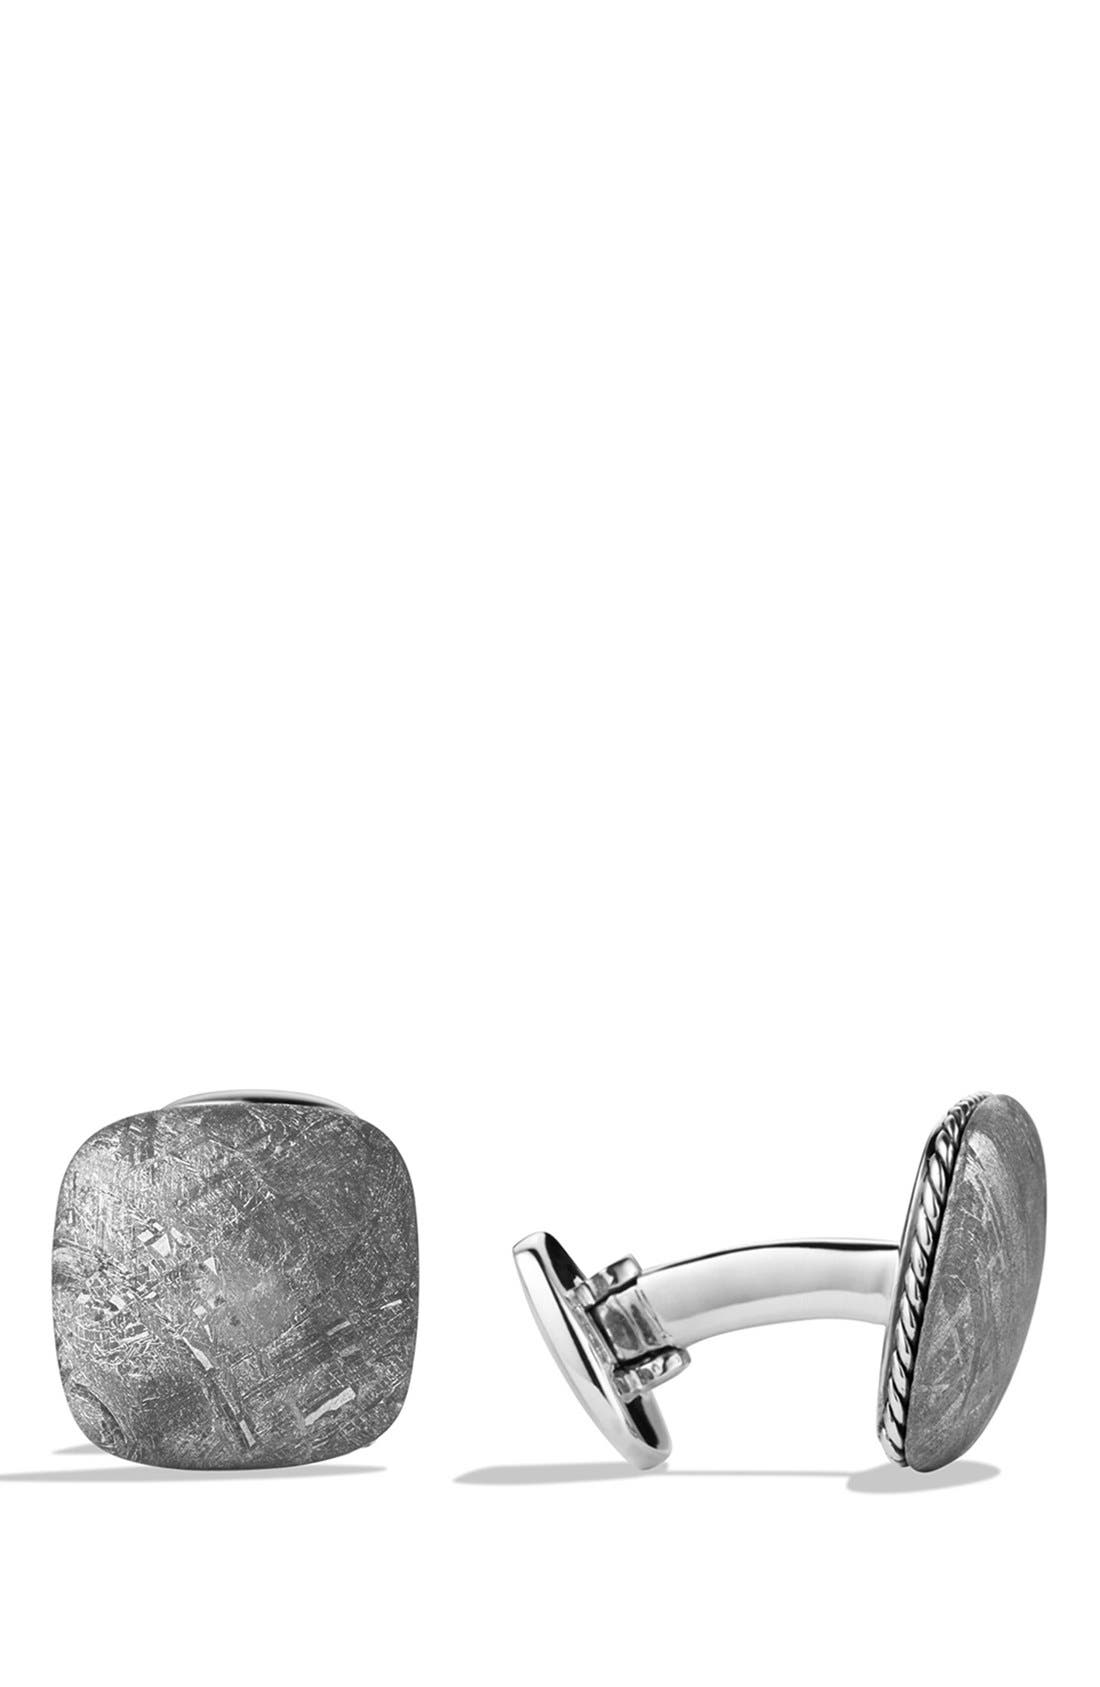 'Streamline' Cuff Links with Semiprecious Stone,                             Main thumbnail 1, color,                             Meteorite